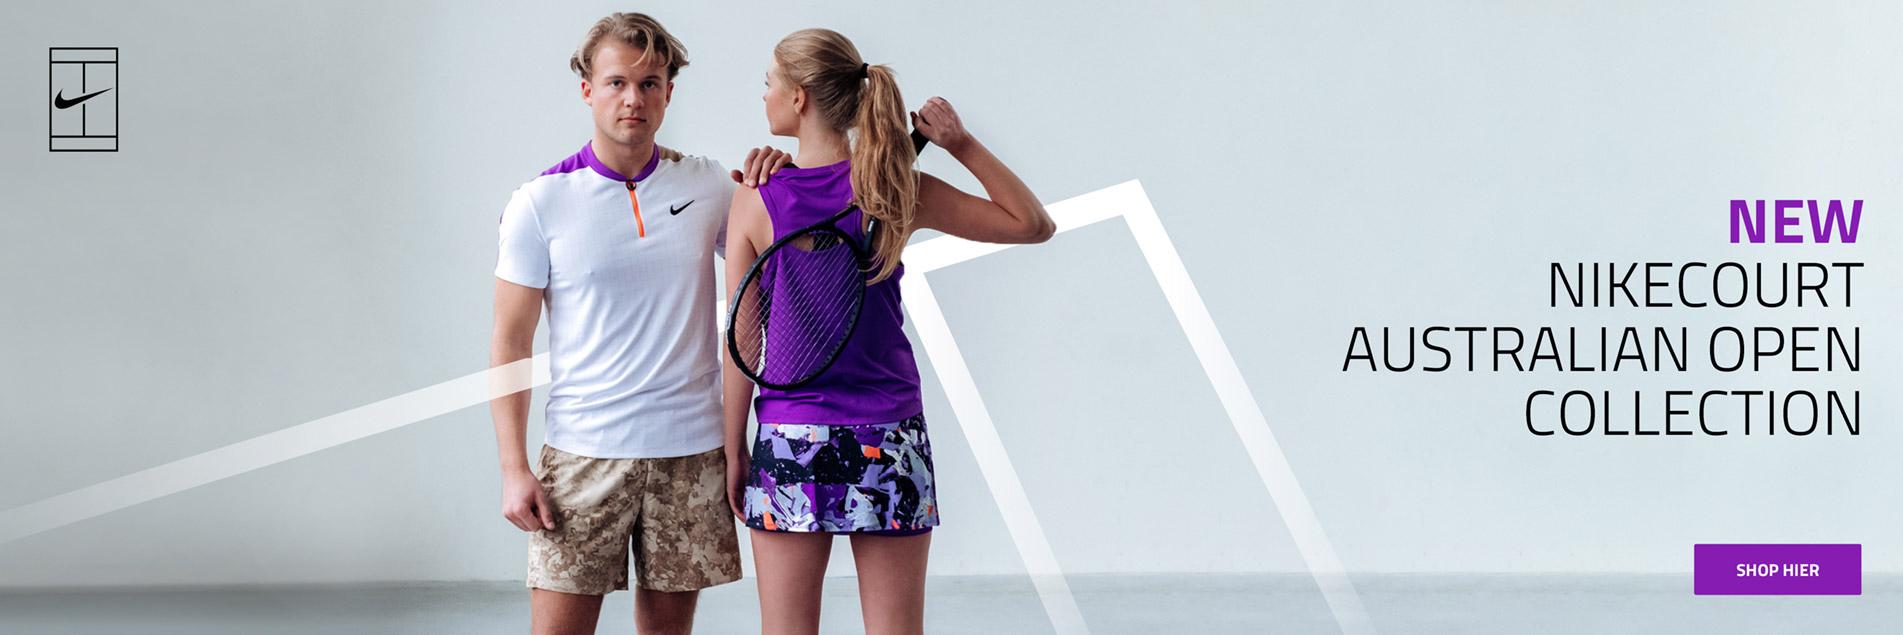 Nike AO Collection